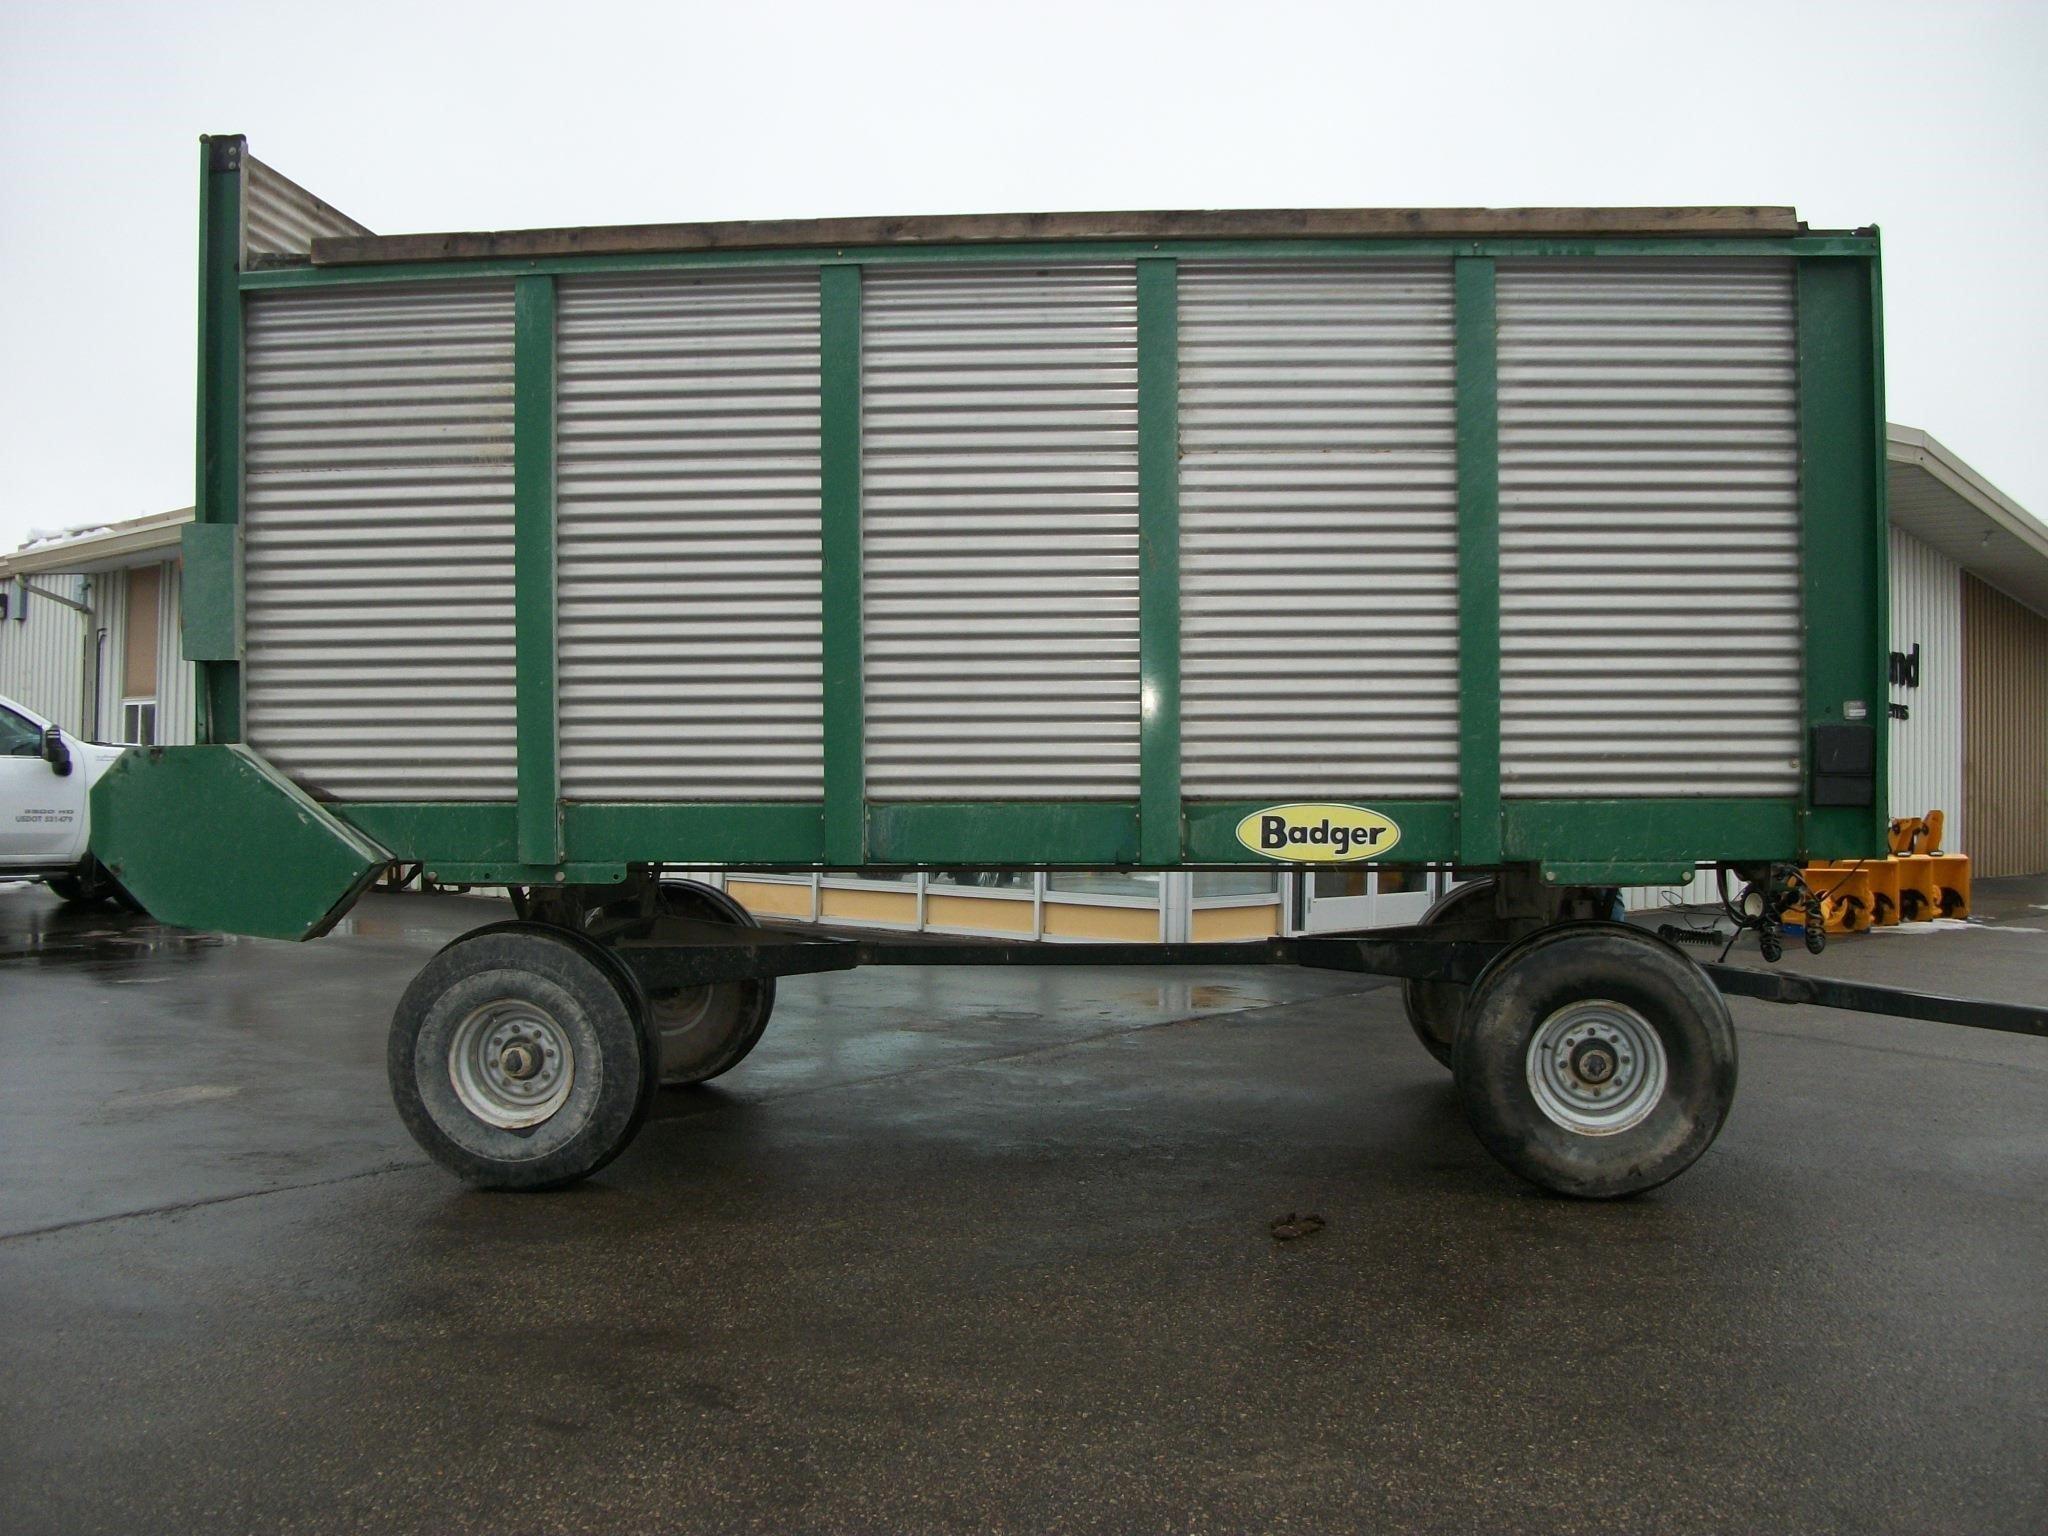 Badger 1200 Forage Wagon